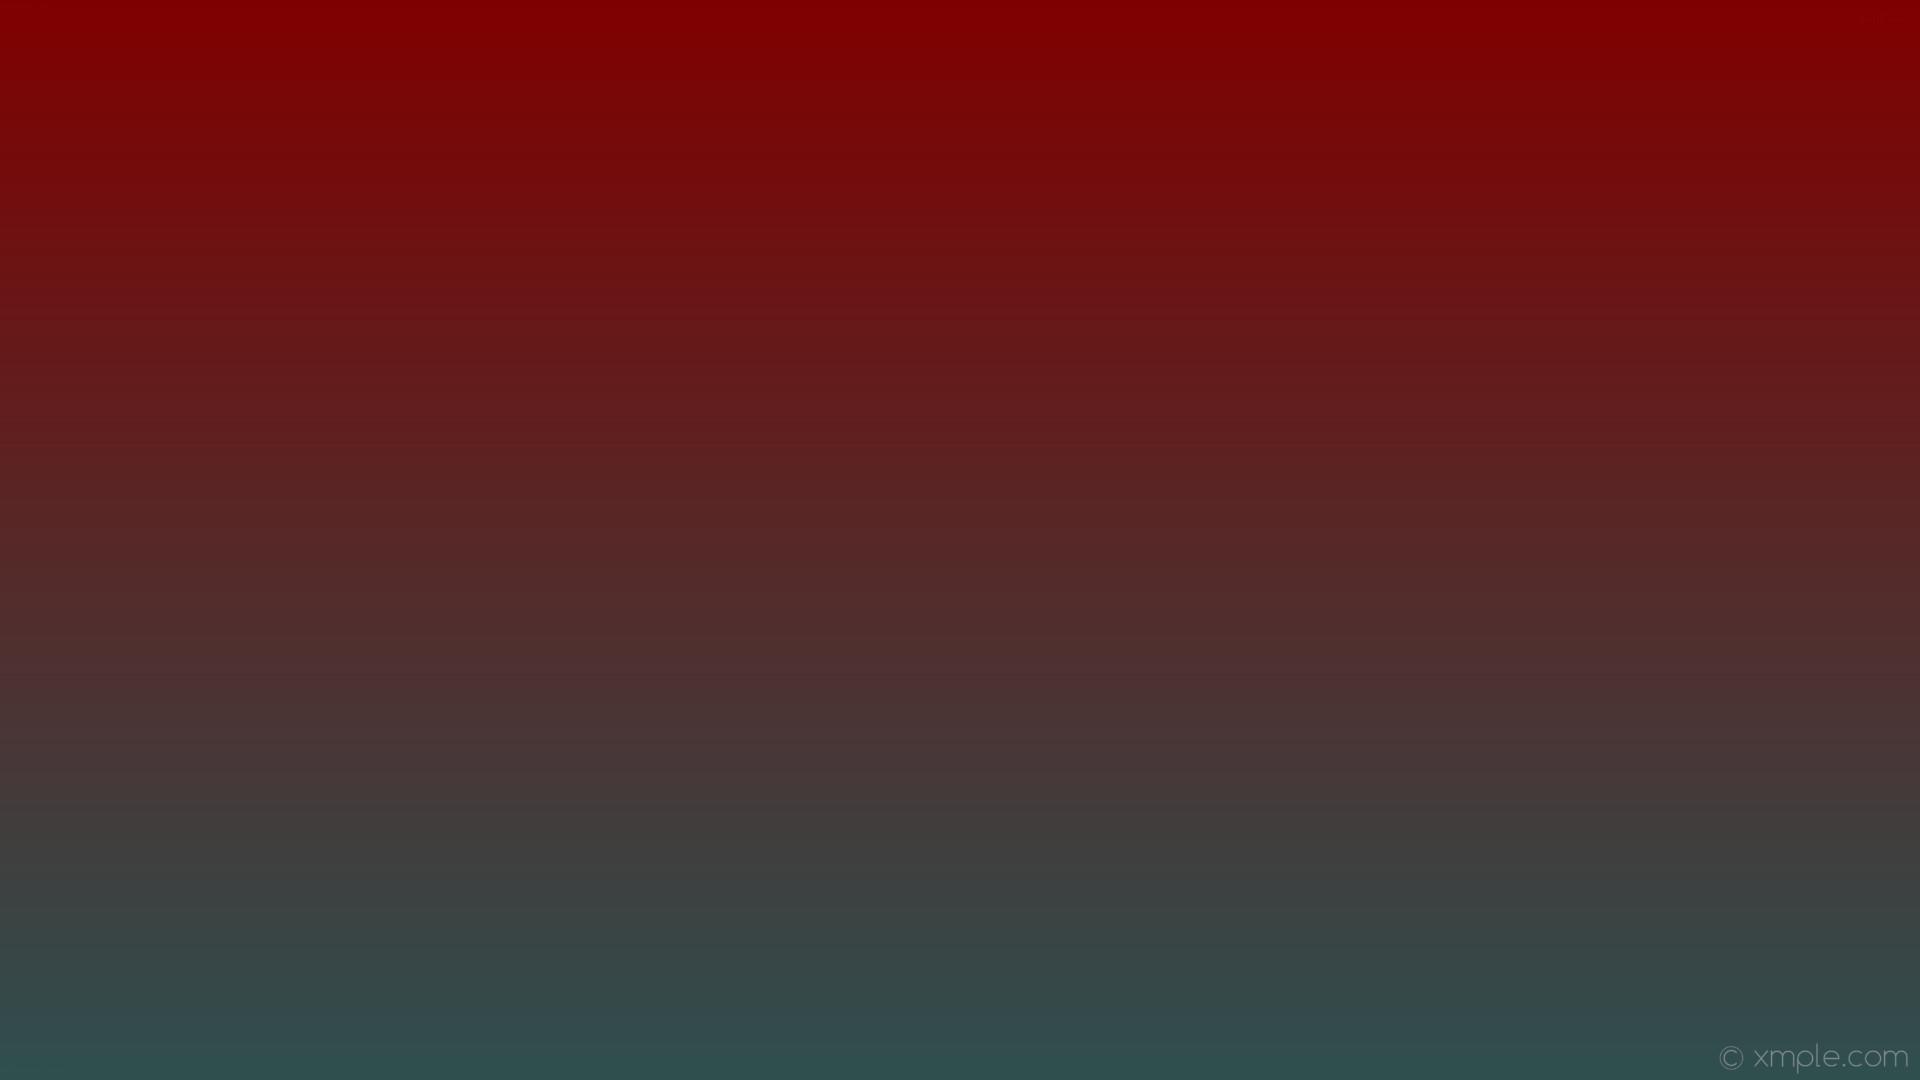 1920x1080, Wallpaper Gradient Grey Brown Linear Maroon - Hd Wallpaper Grey And Dark Red - HD Wallpaper